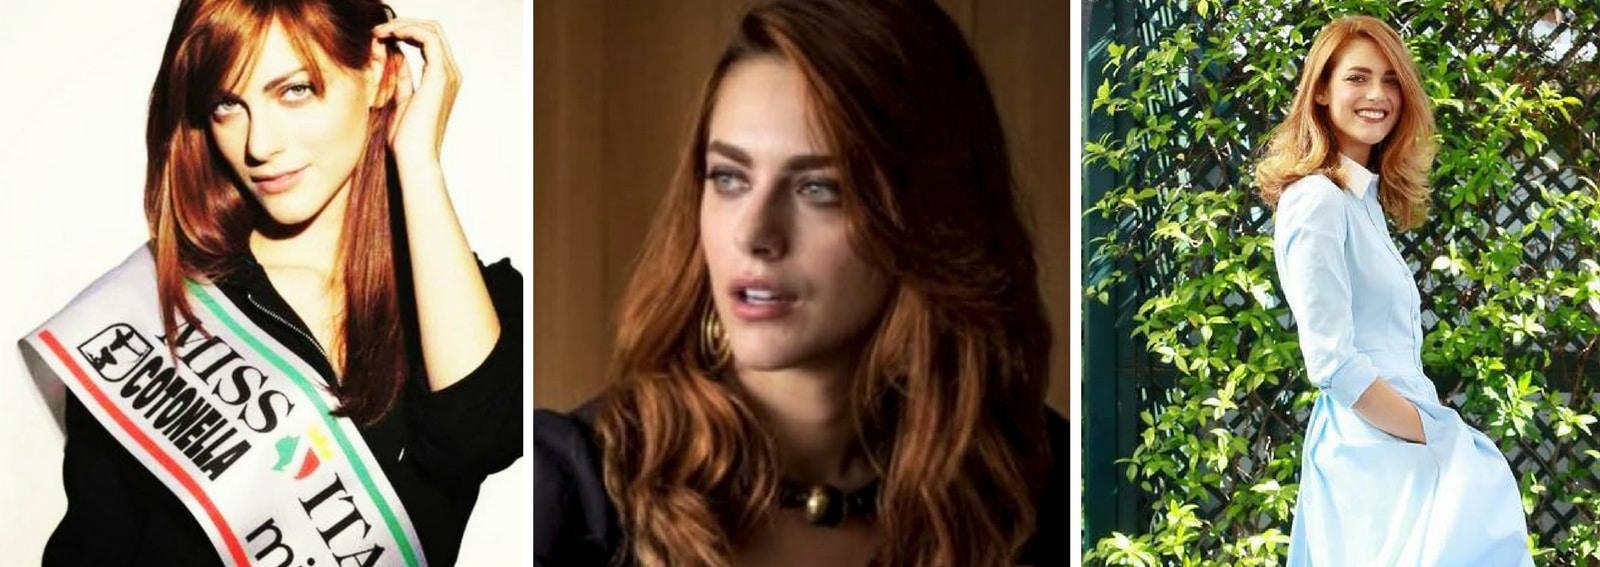 Miriam Leone vita curiosita famiglia passioni film carriera miss italia amori love storyDESK